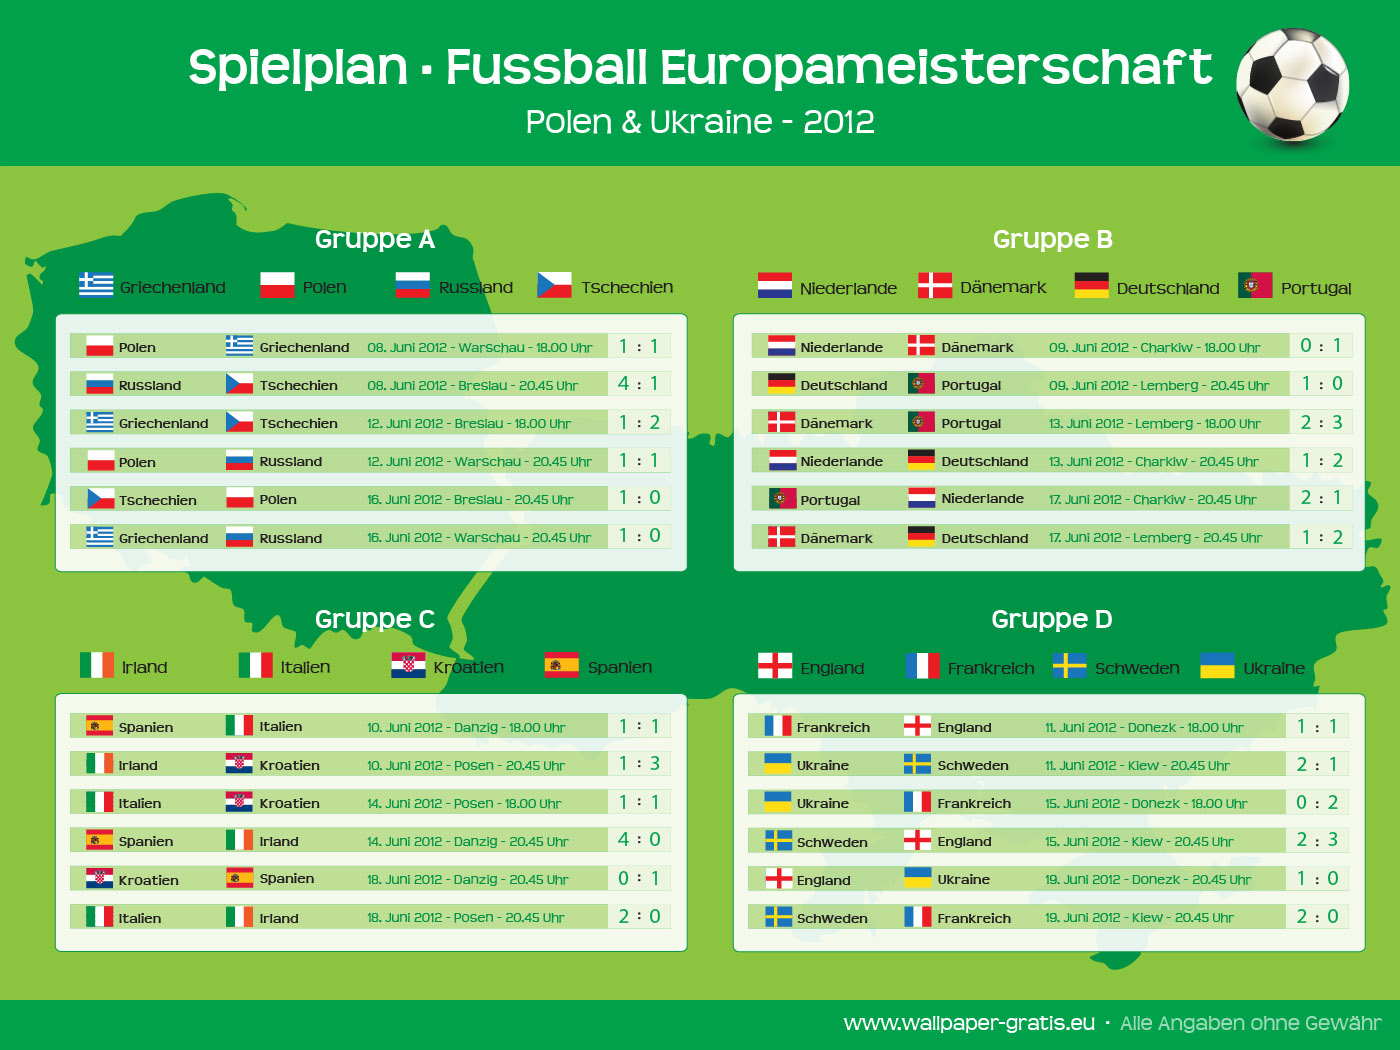 FuГџball Em Polen Spielplan